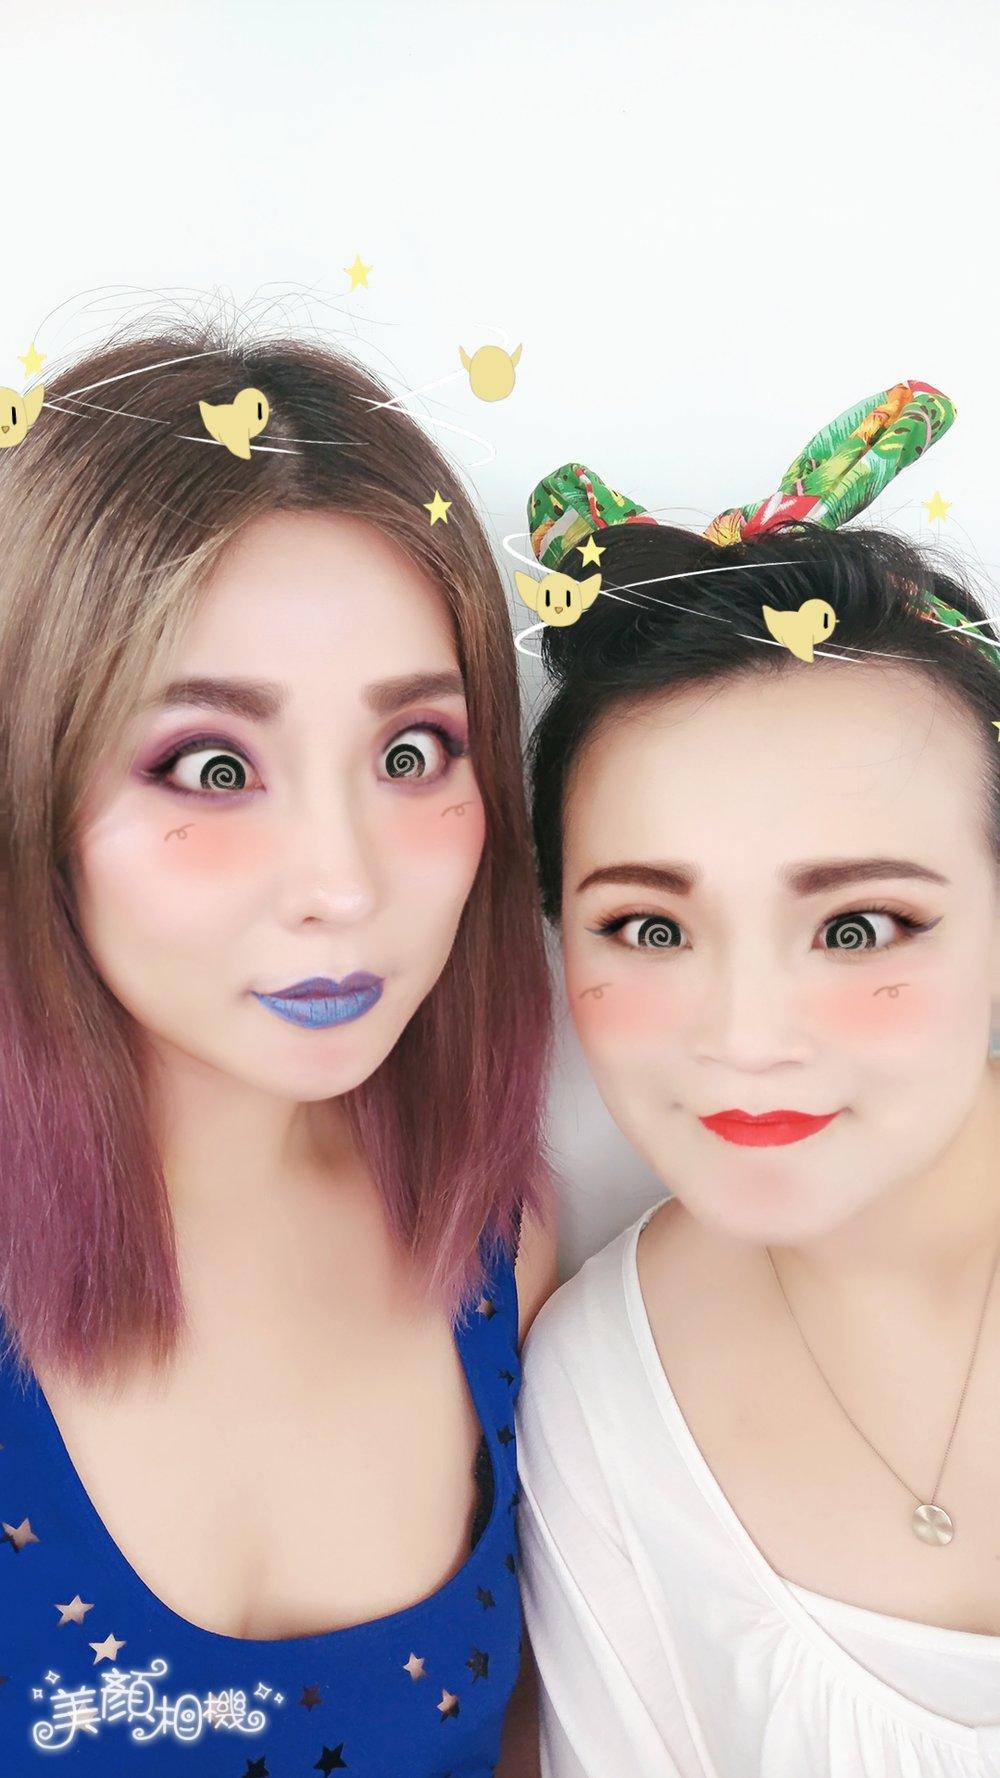 MYXJ_20170917155131_fast[1].jpg